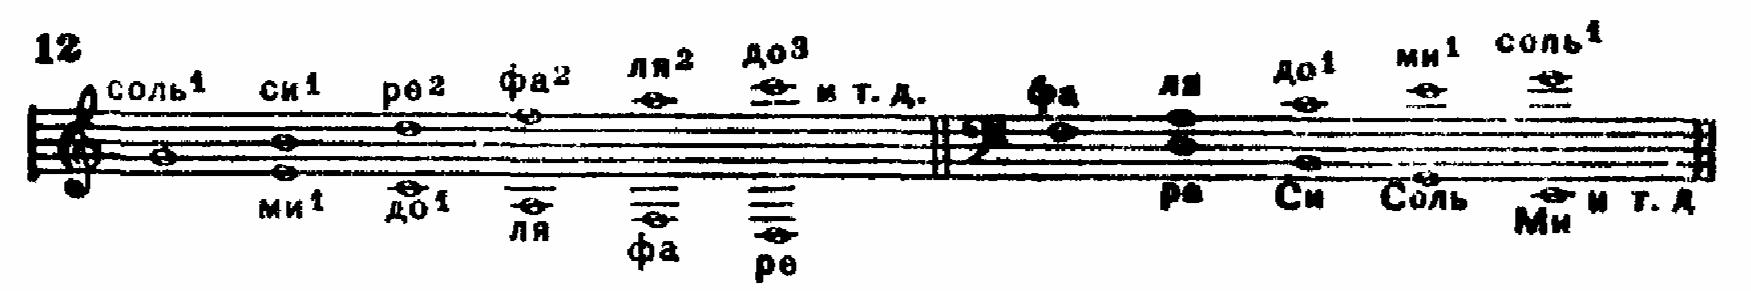 Такт (музыка) — энциклопедия гитармага